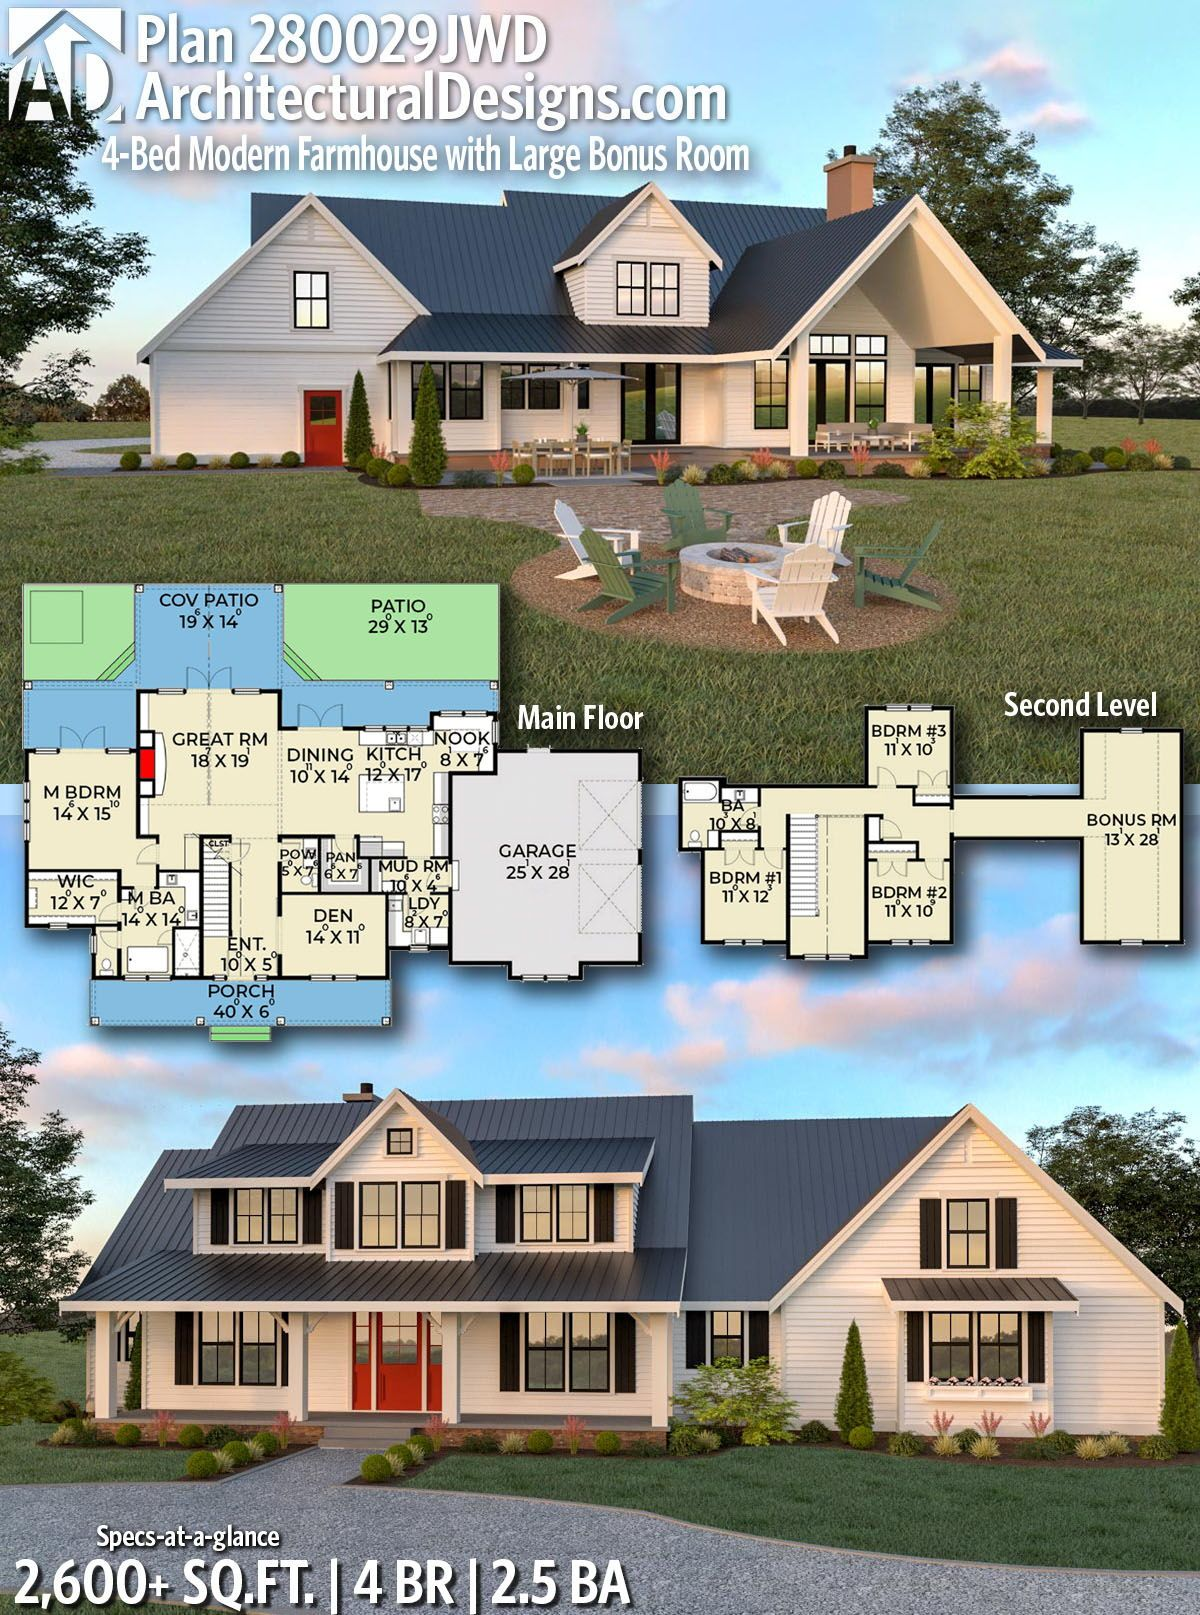 Plan 280029jwd 4 Bed Modern Farmhouse With Large Bonus Room In 2020 Farmhouse Plans New House Plans Dream House Plans